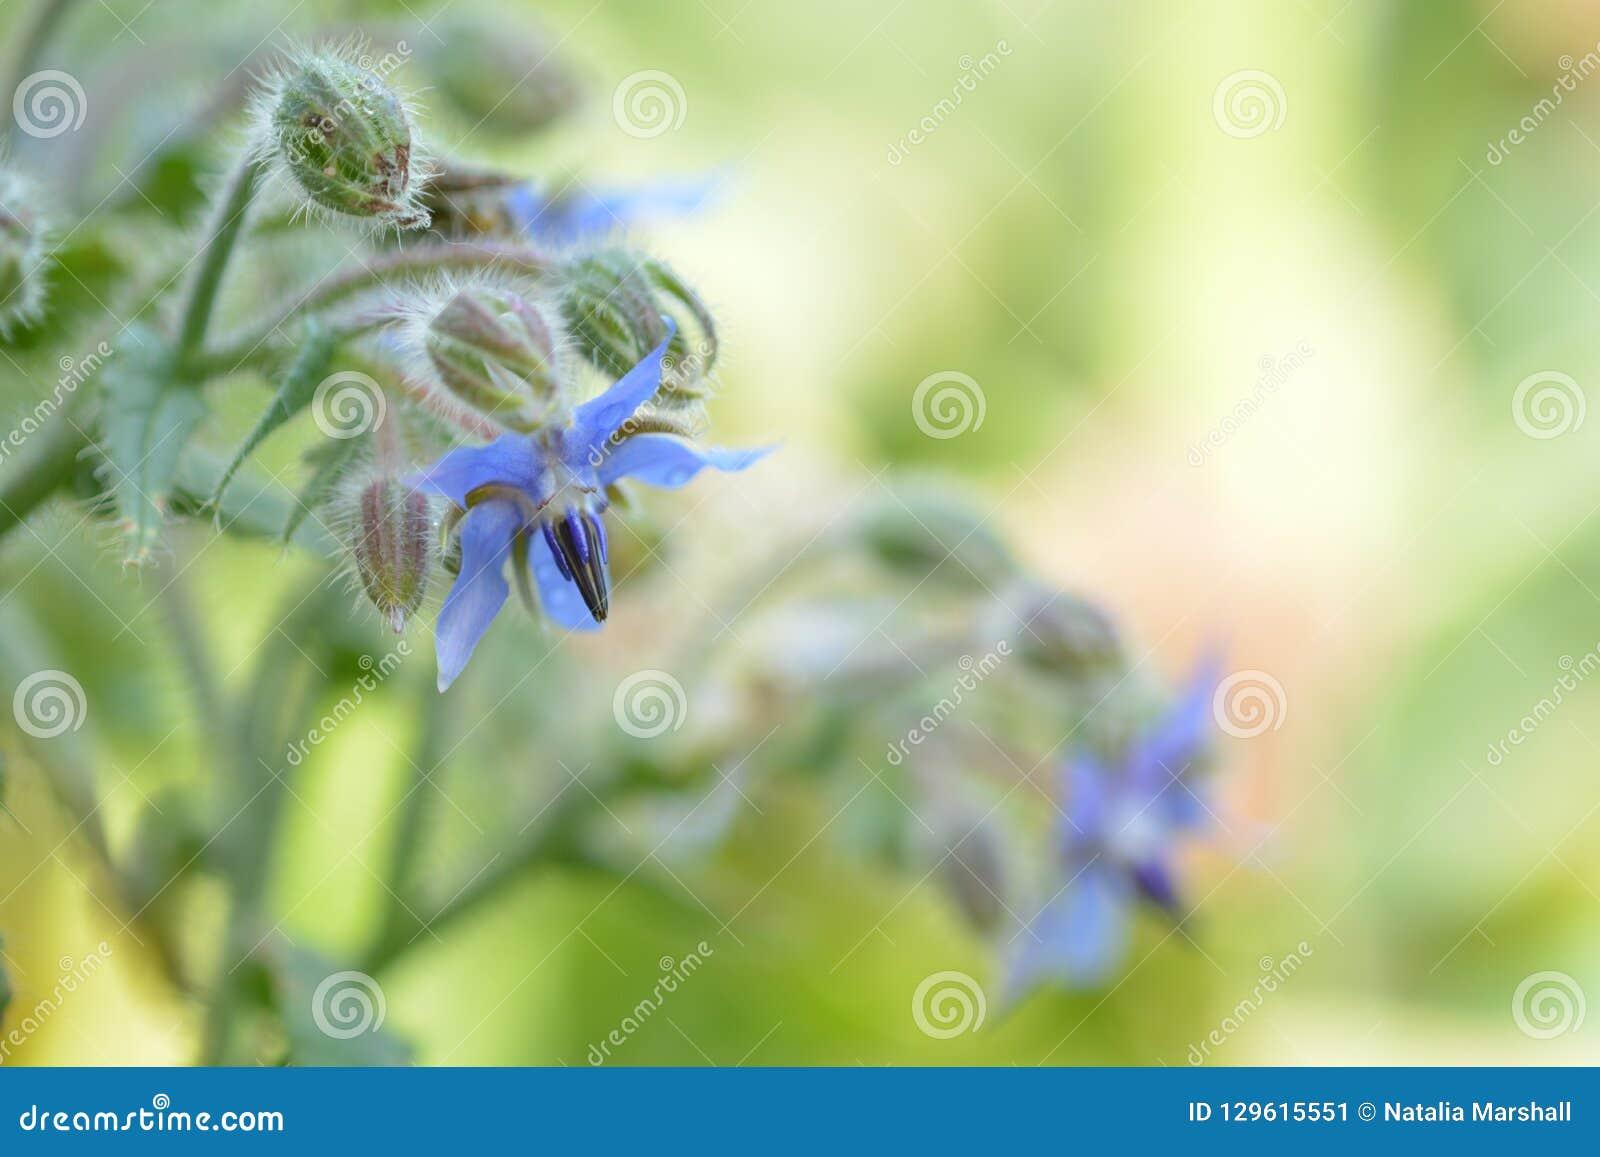 Close up photo of a borage plant, soft light and colours